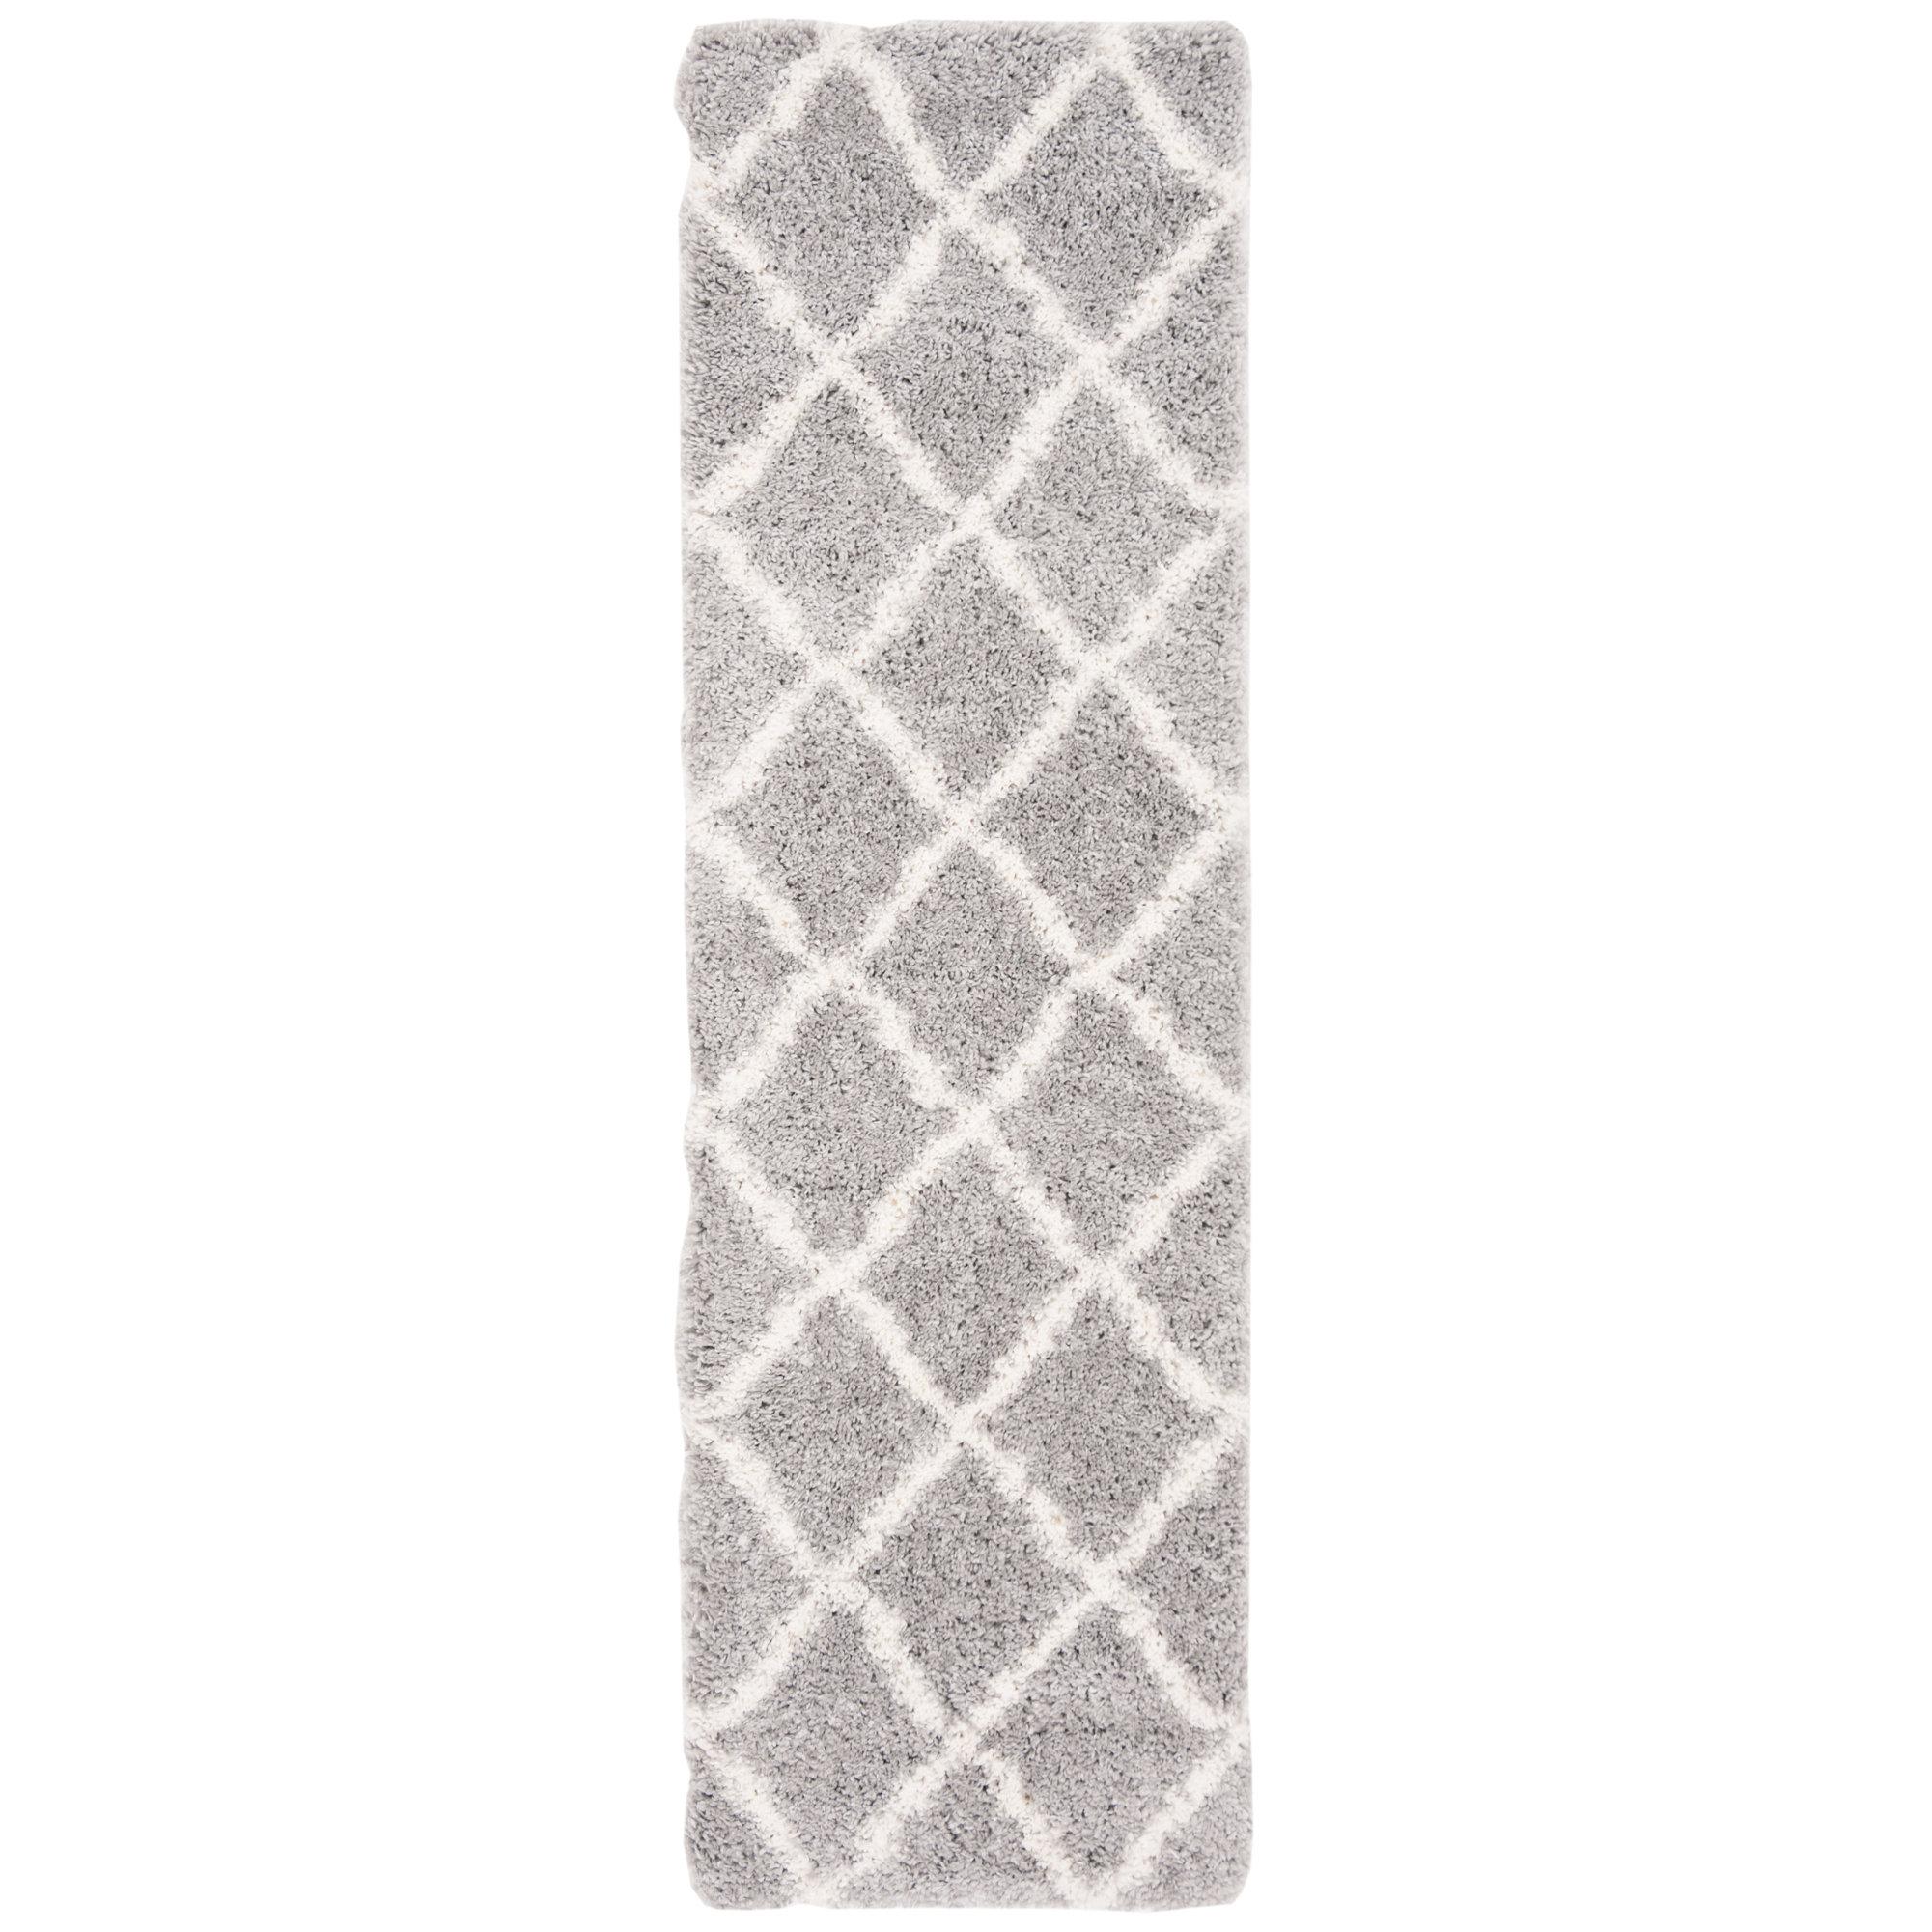 Union Rustic Almaden Gray/Cream Area Rug